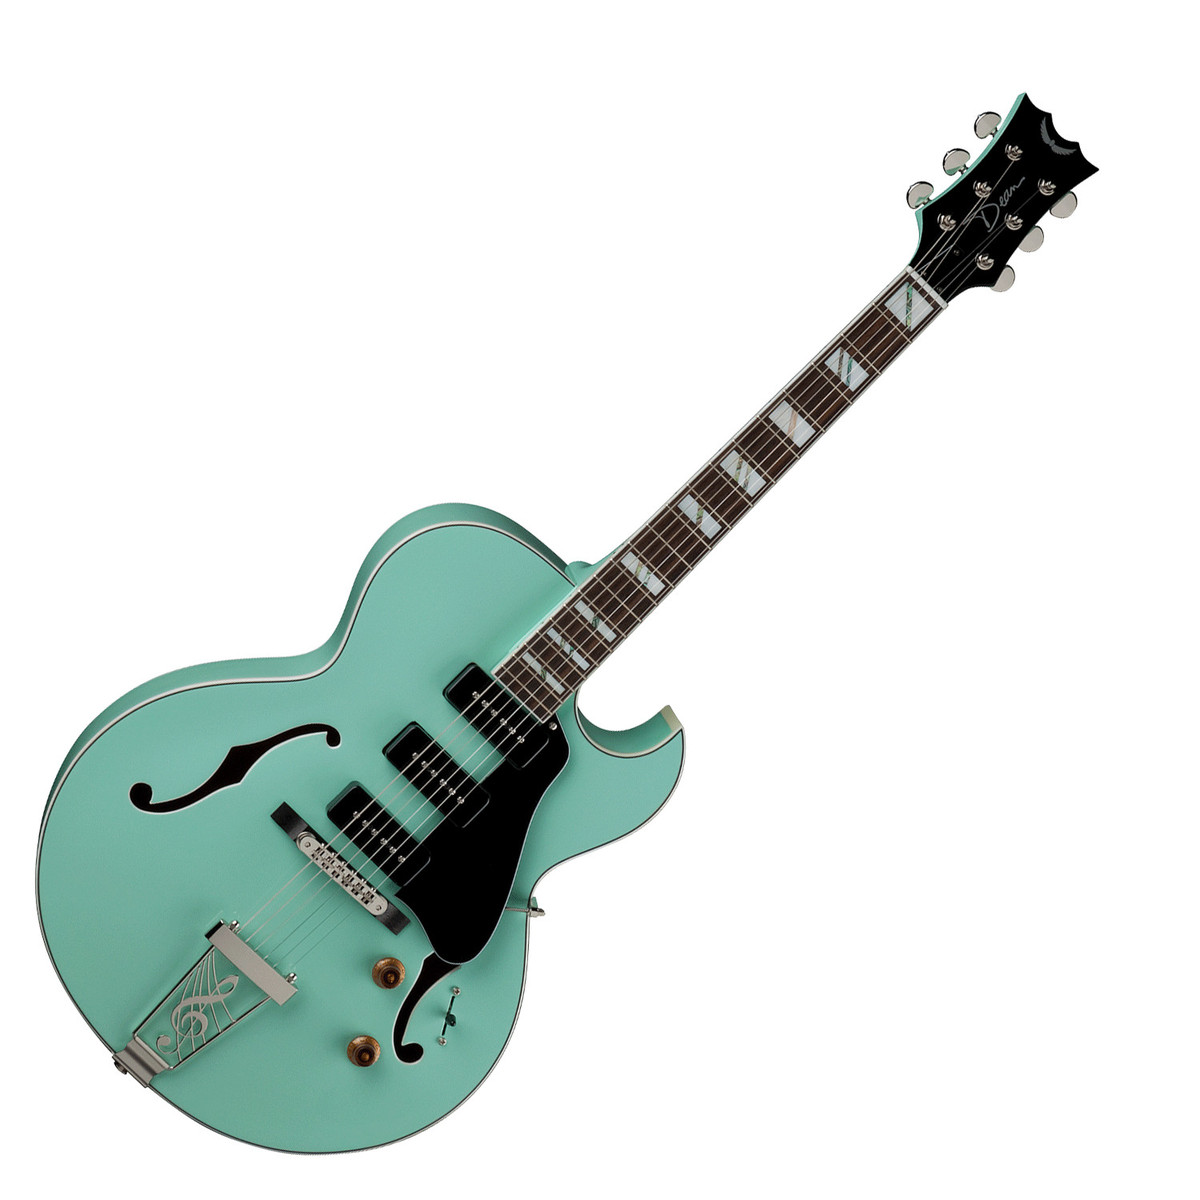 Disc Dean Palomino Hollowbody Guitar Sea Green At Gear4music